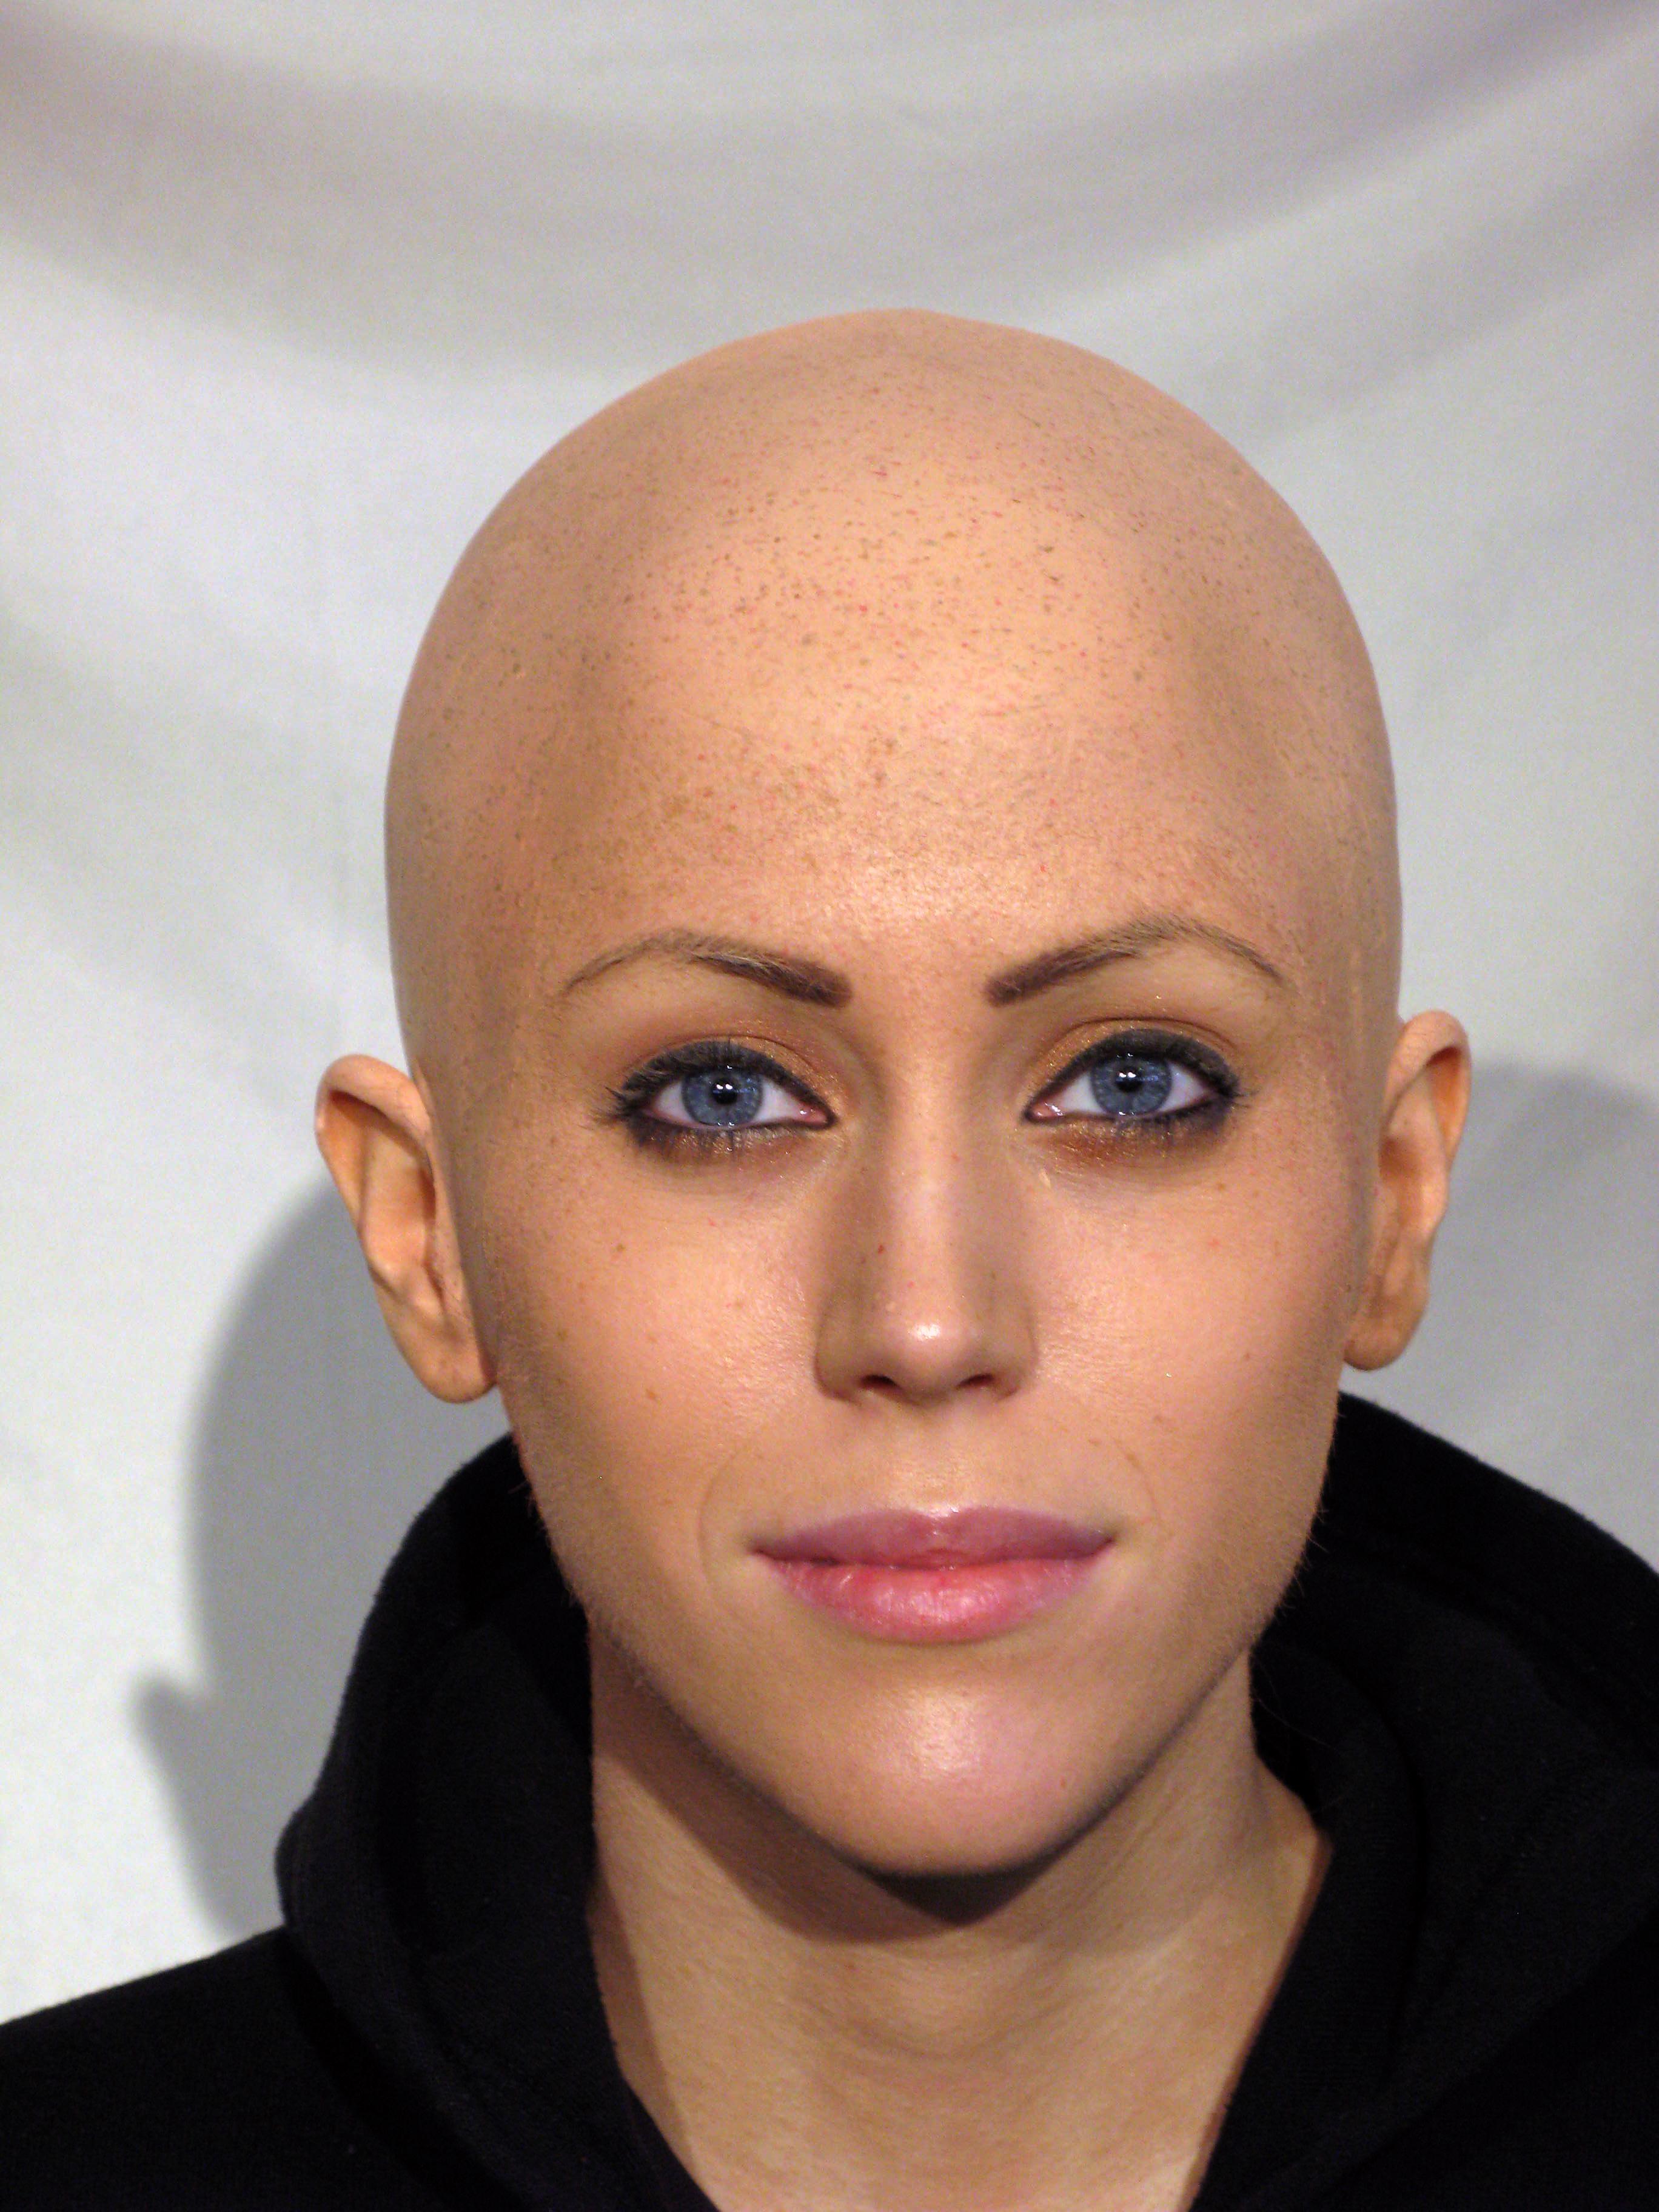 Makeup Design Bald Caps Pirates Aliens Vampires And